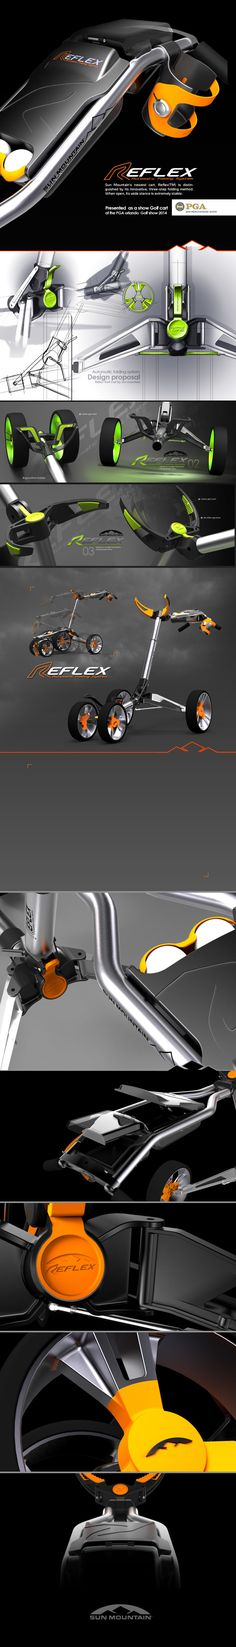 Reflex Golf cart design presented at the PGA show 2014 in ORLANDO